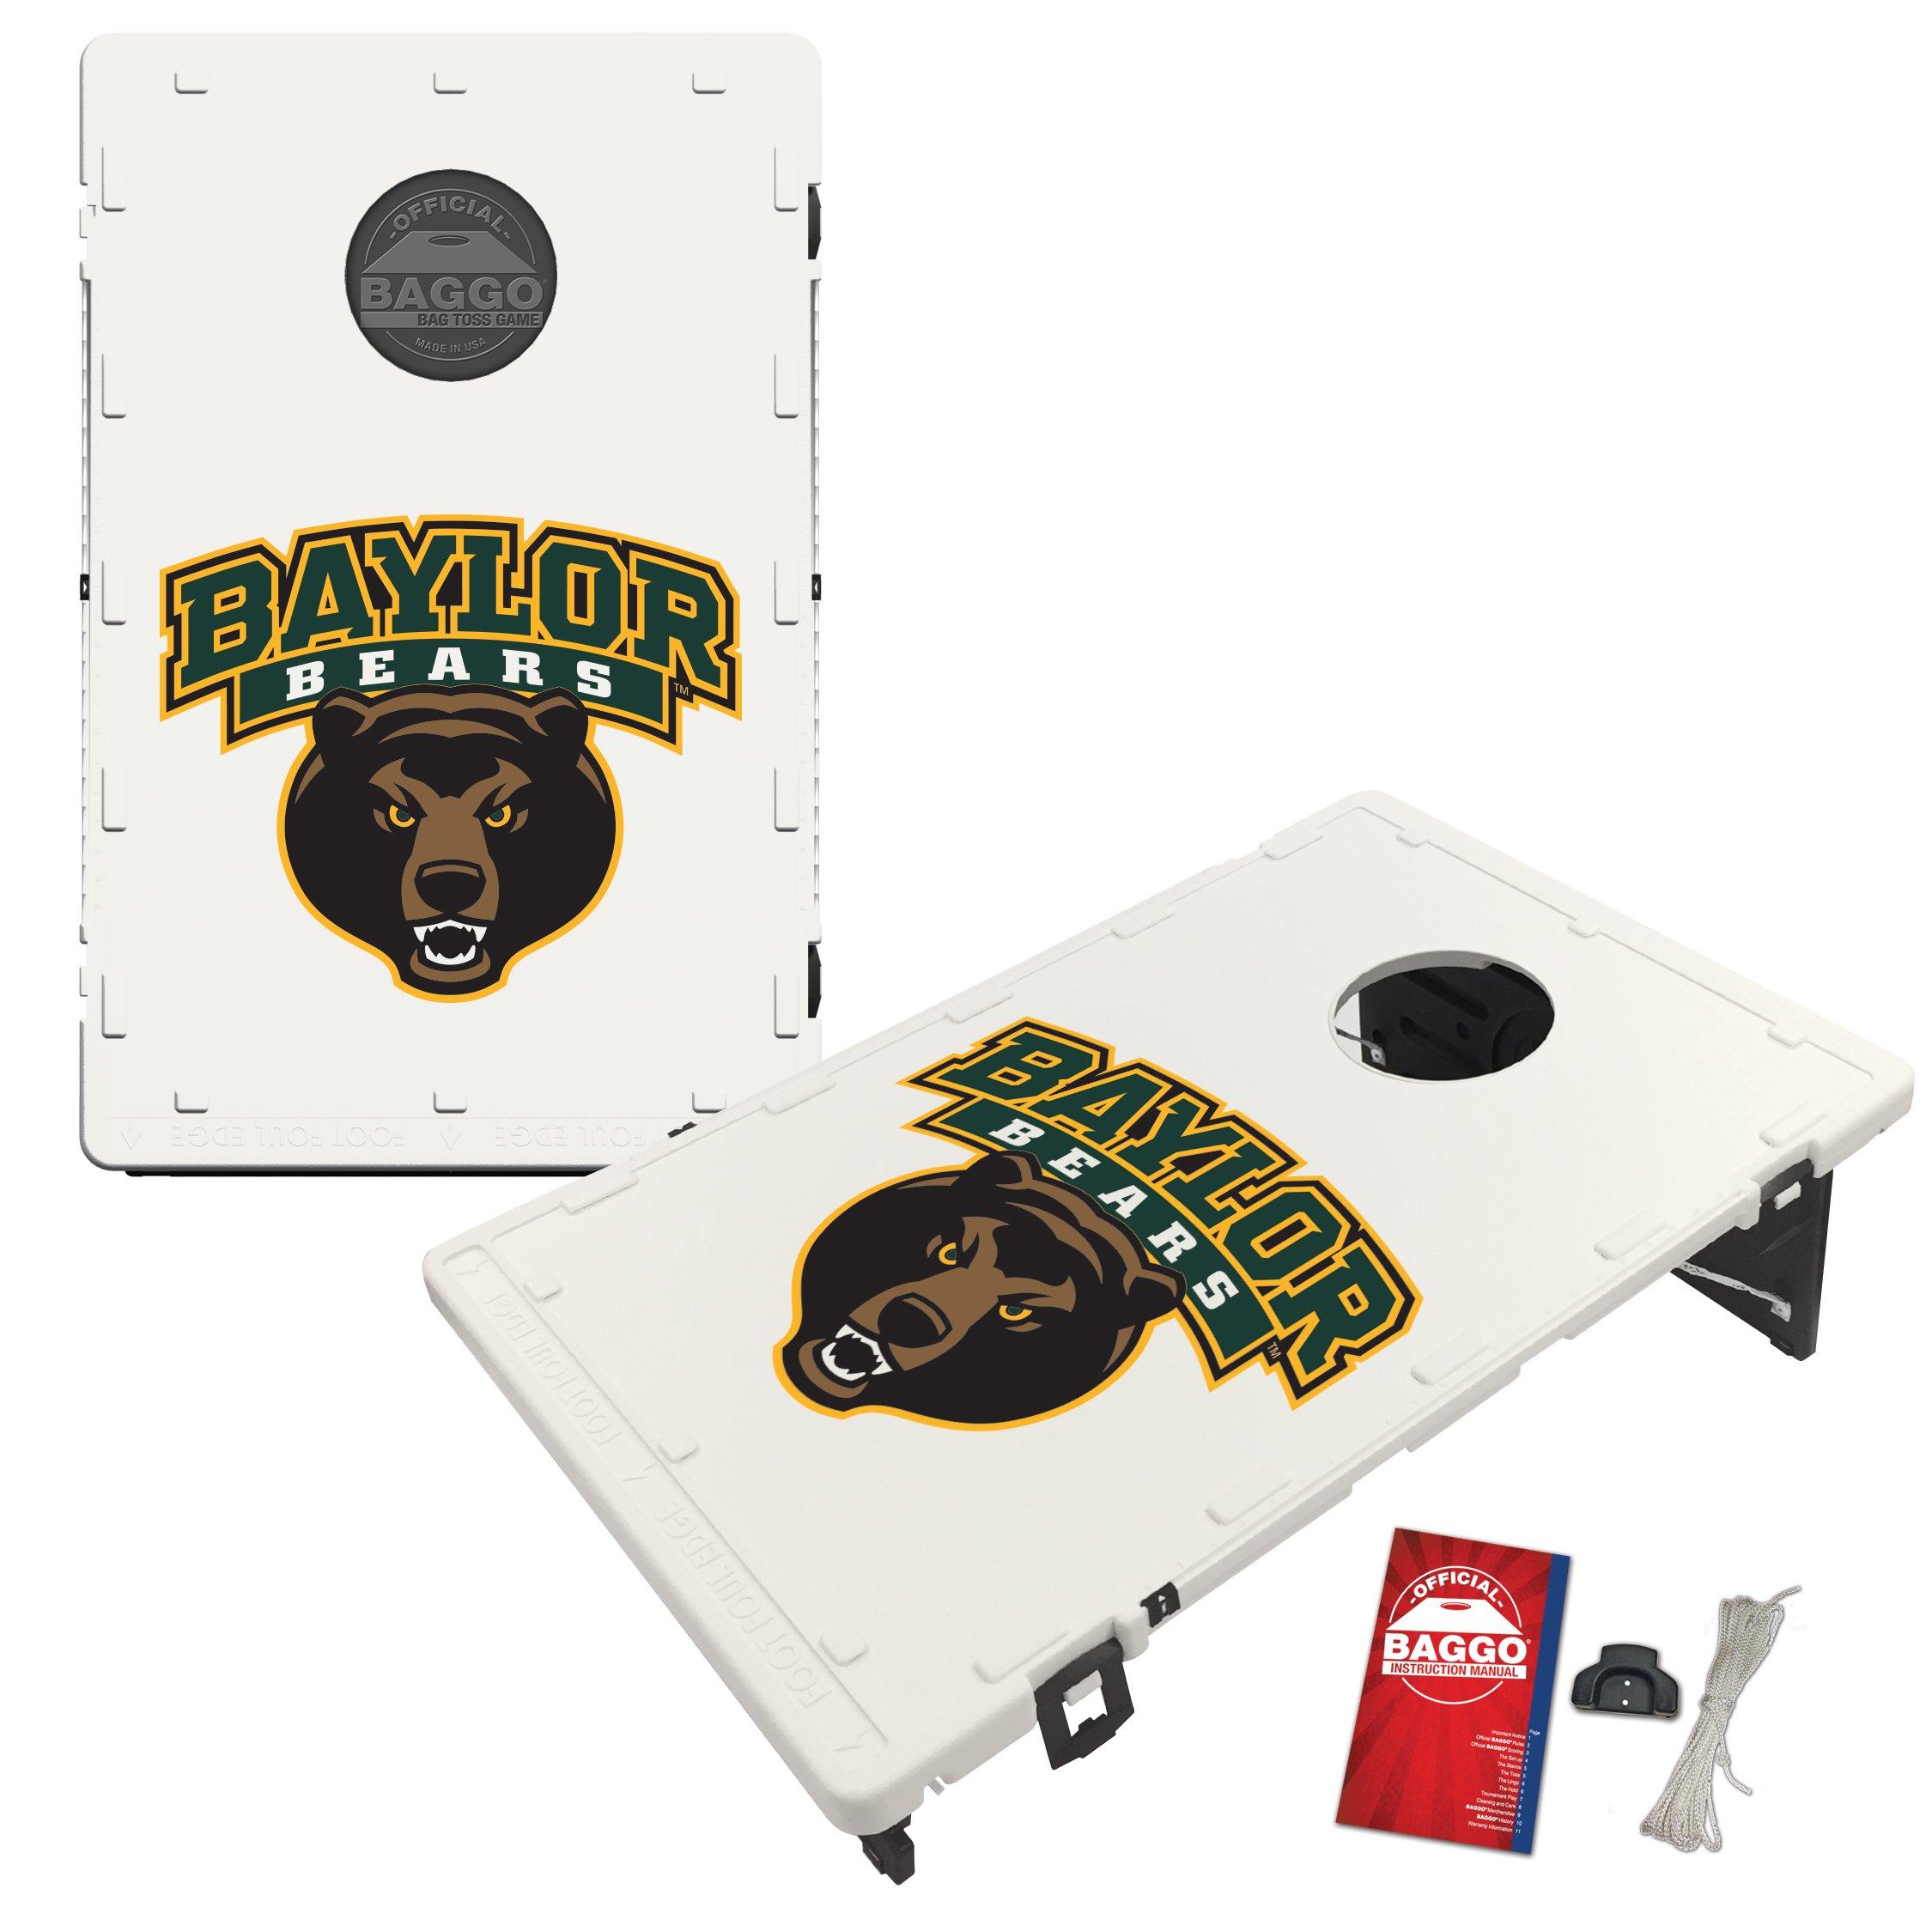 Baylor University Bears Baggo Bean Bag Toss Cornhole Game Classic Design